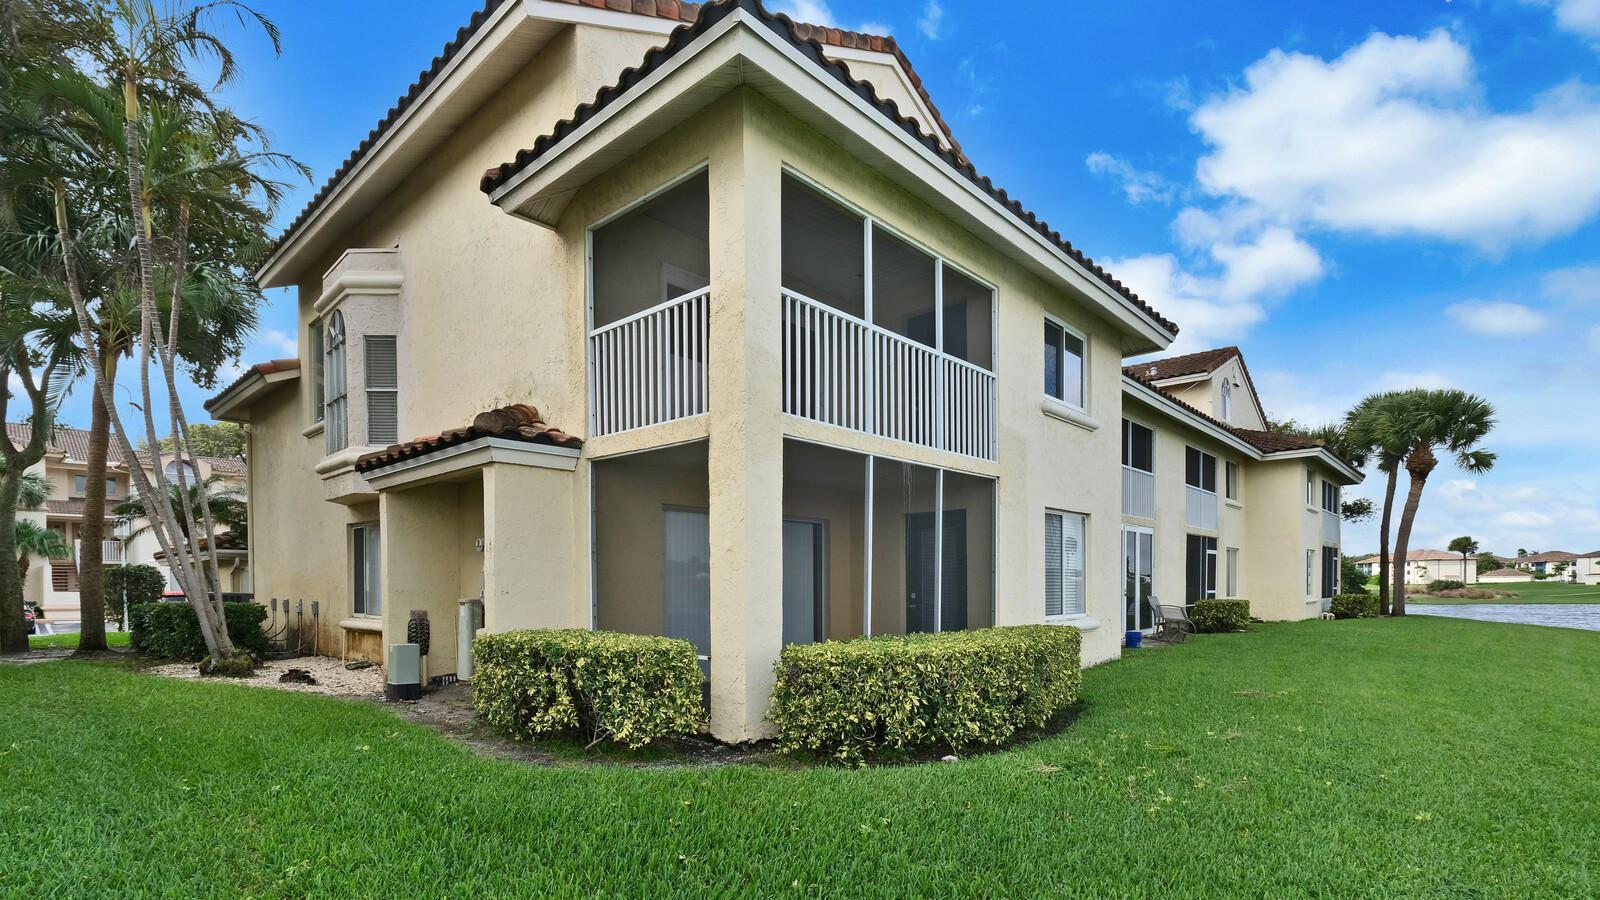 11104 Glenmoor Drive, West Palm Beach, FL 33409 - #: RX-10667534